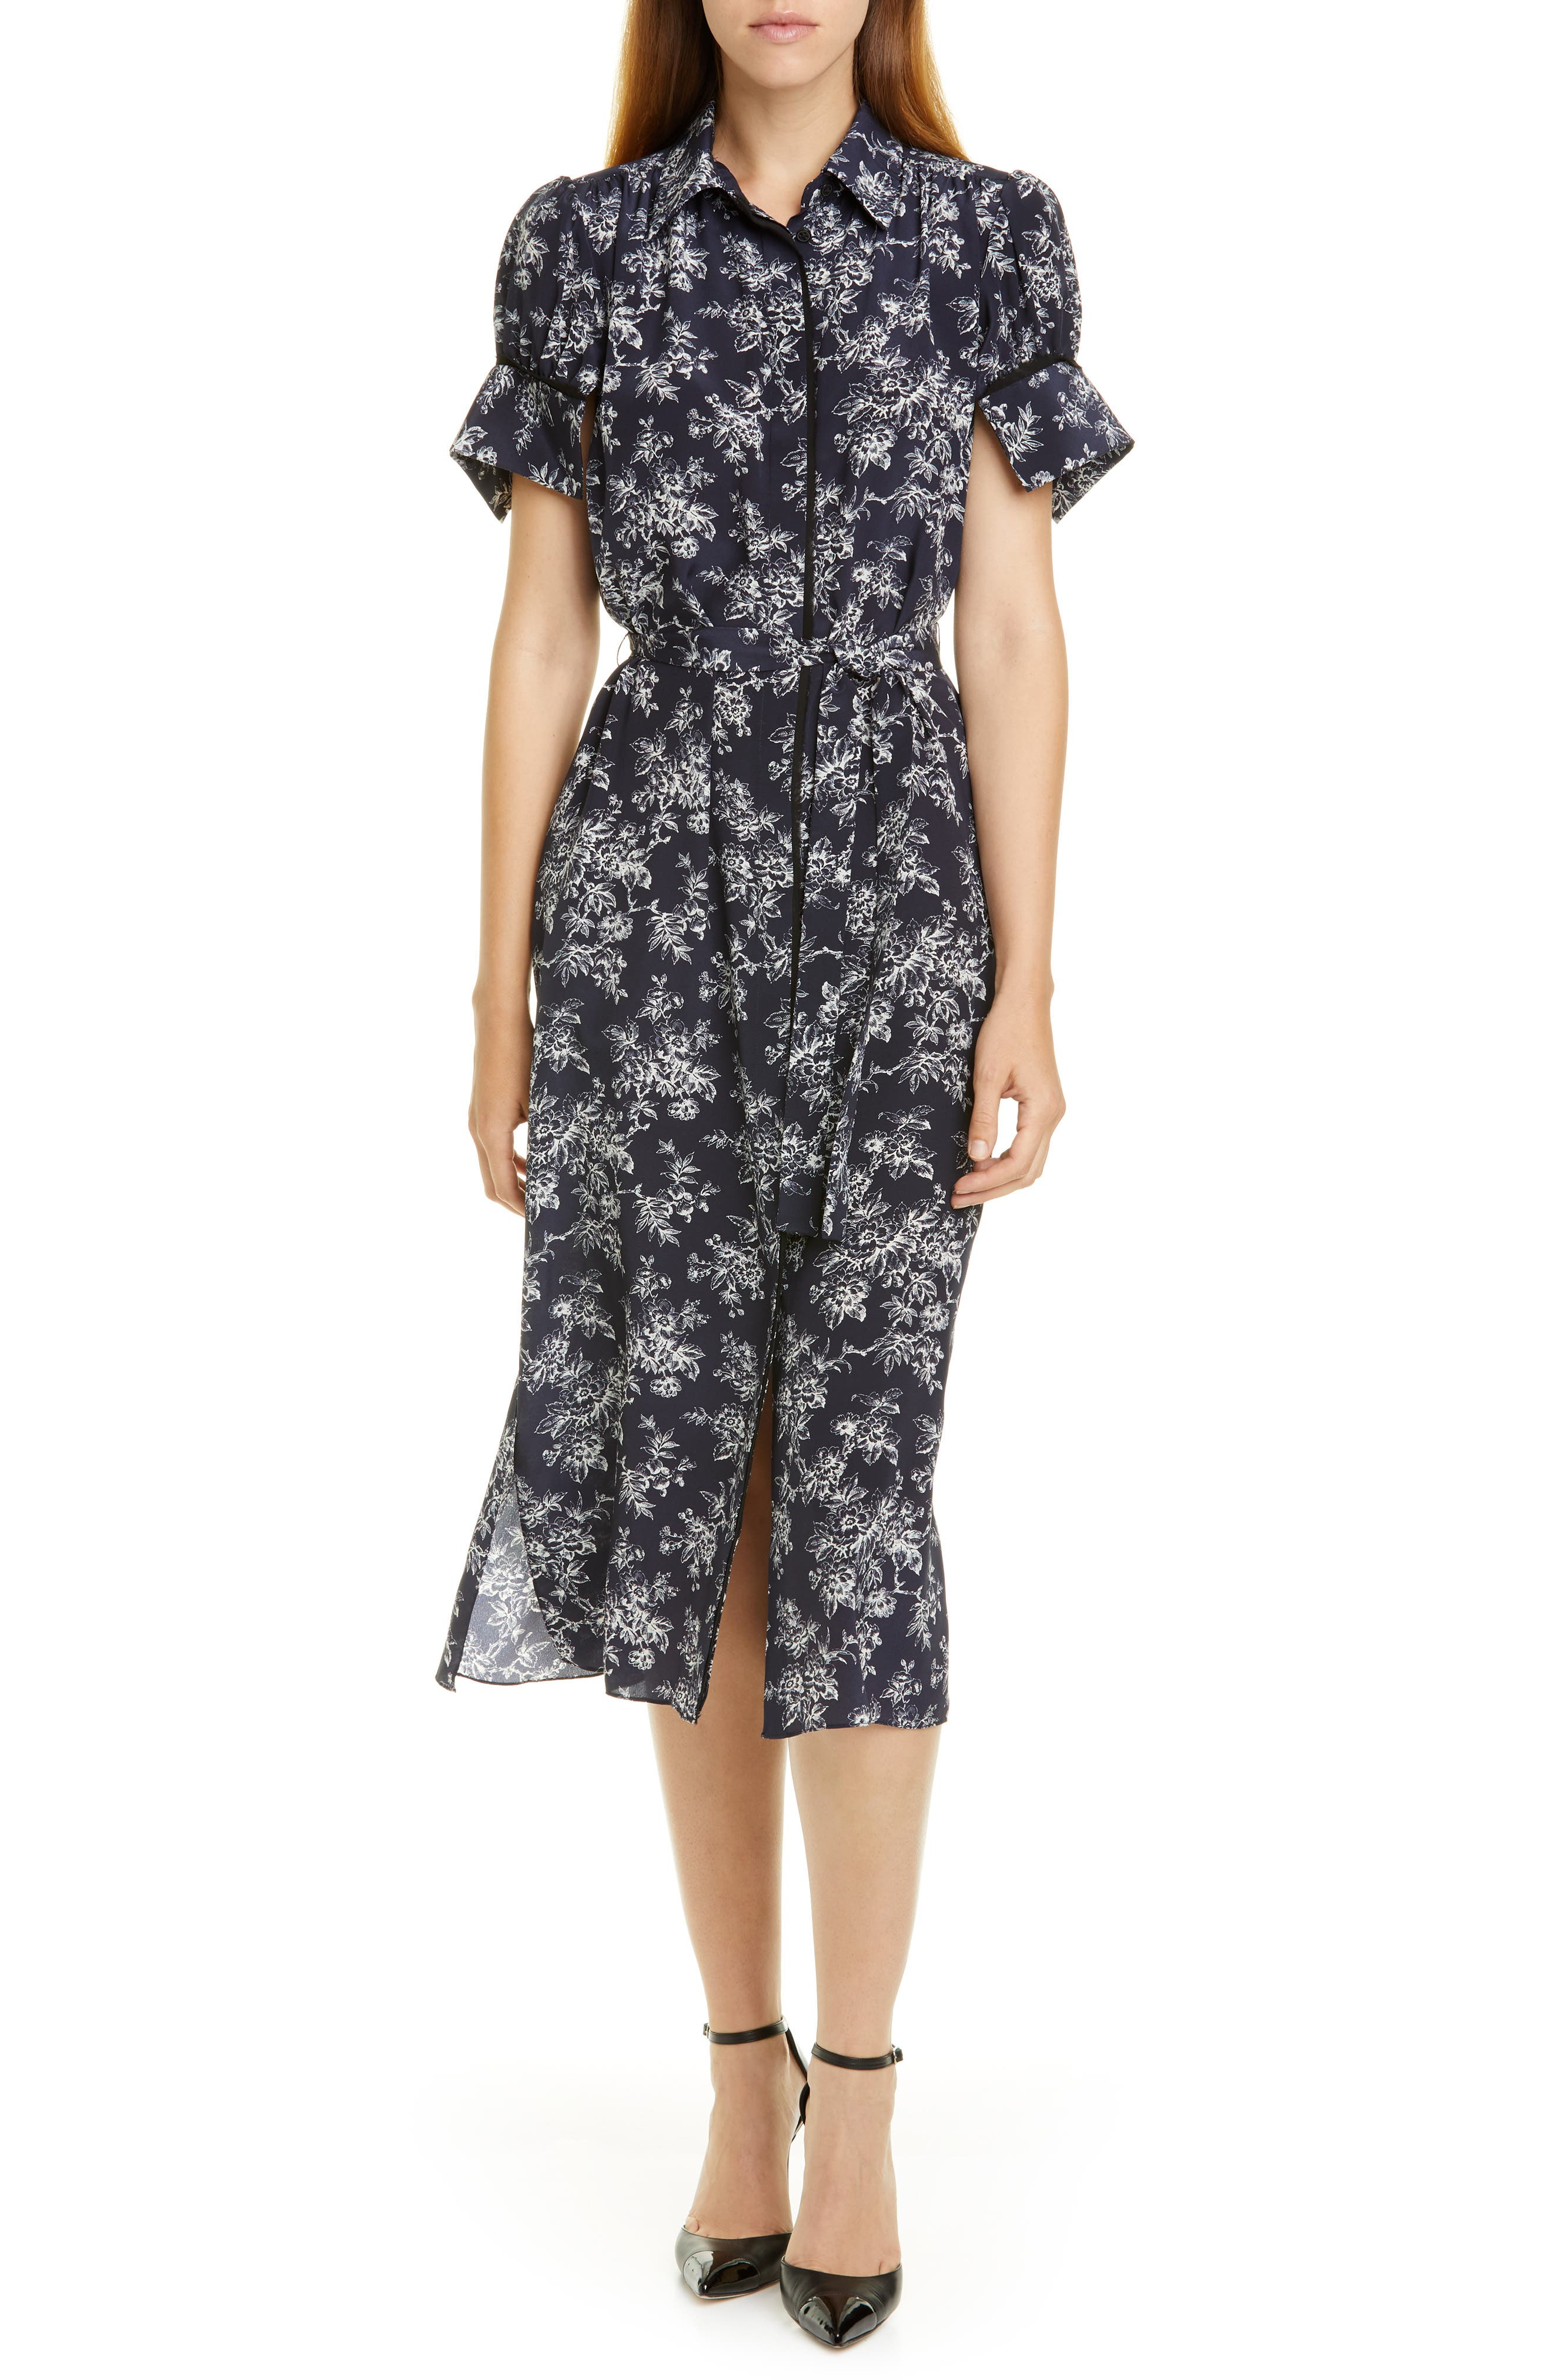 Jason Wu Dresses Floral Shirtdress